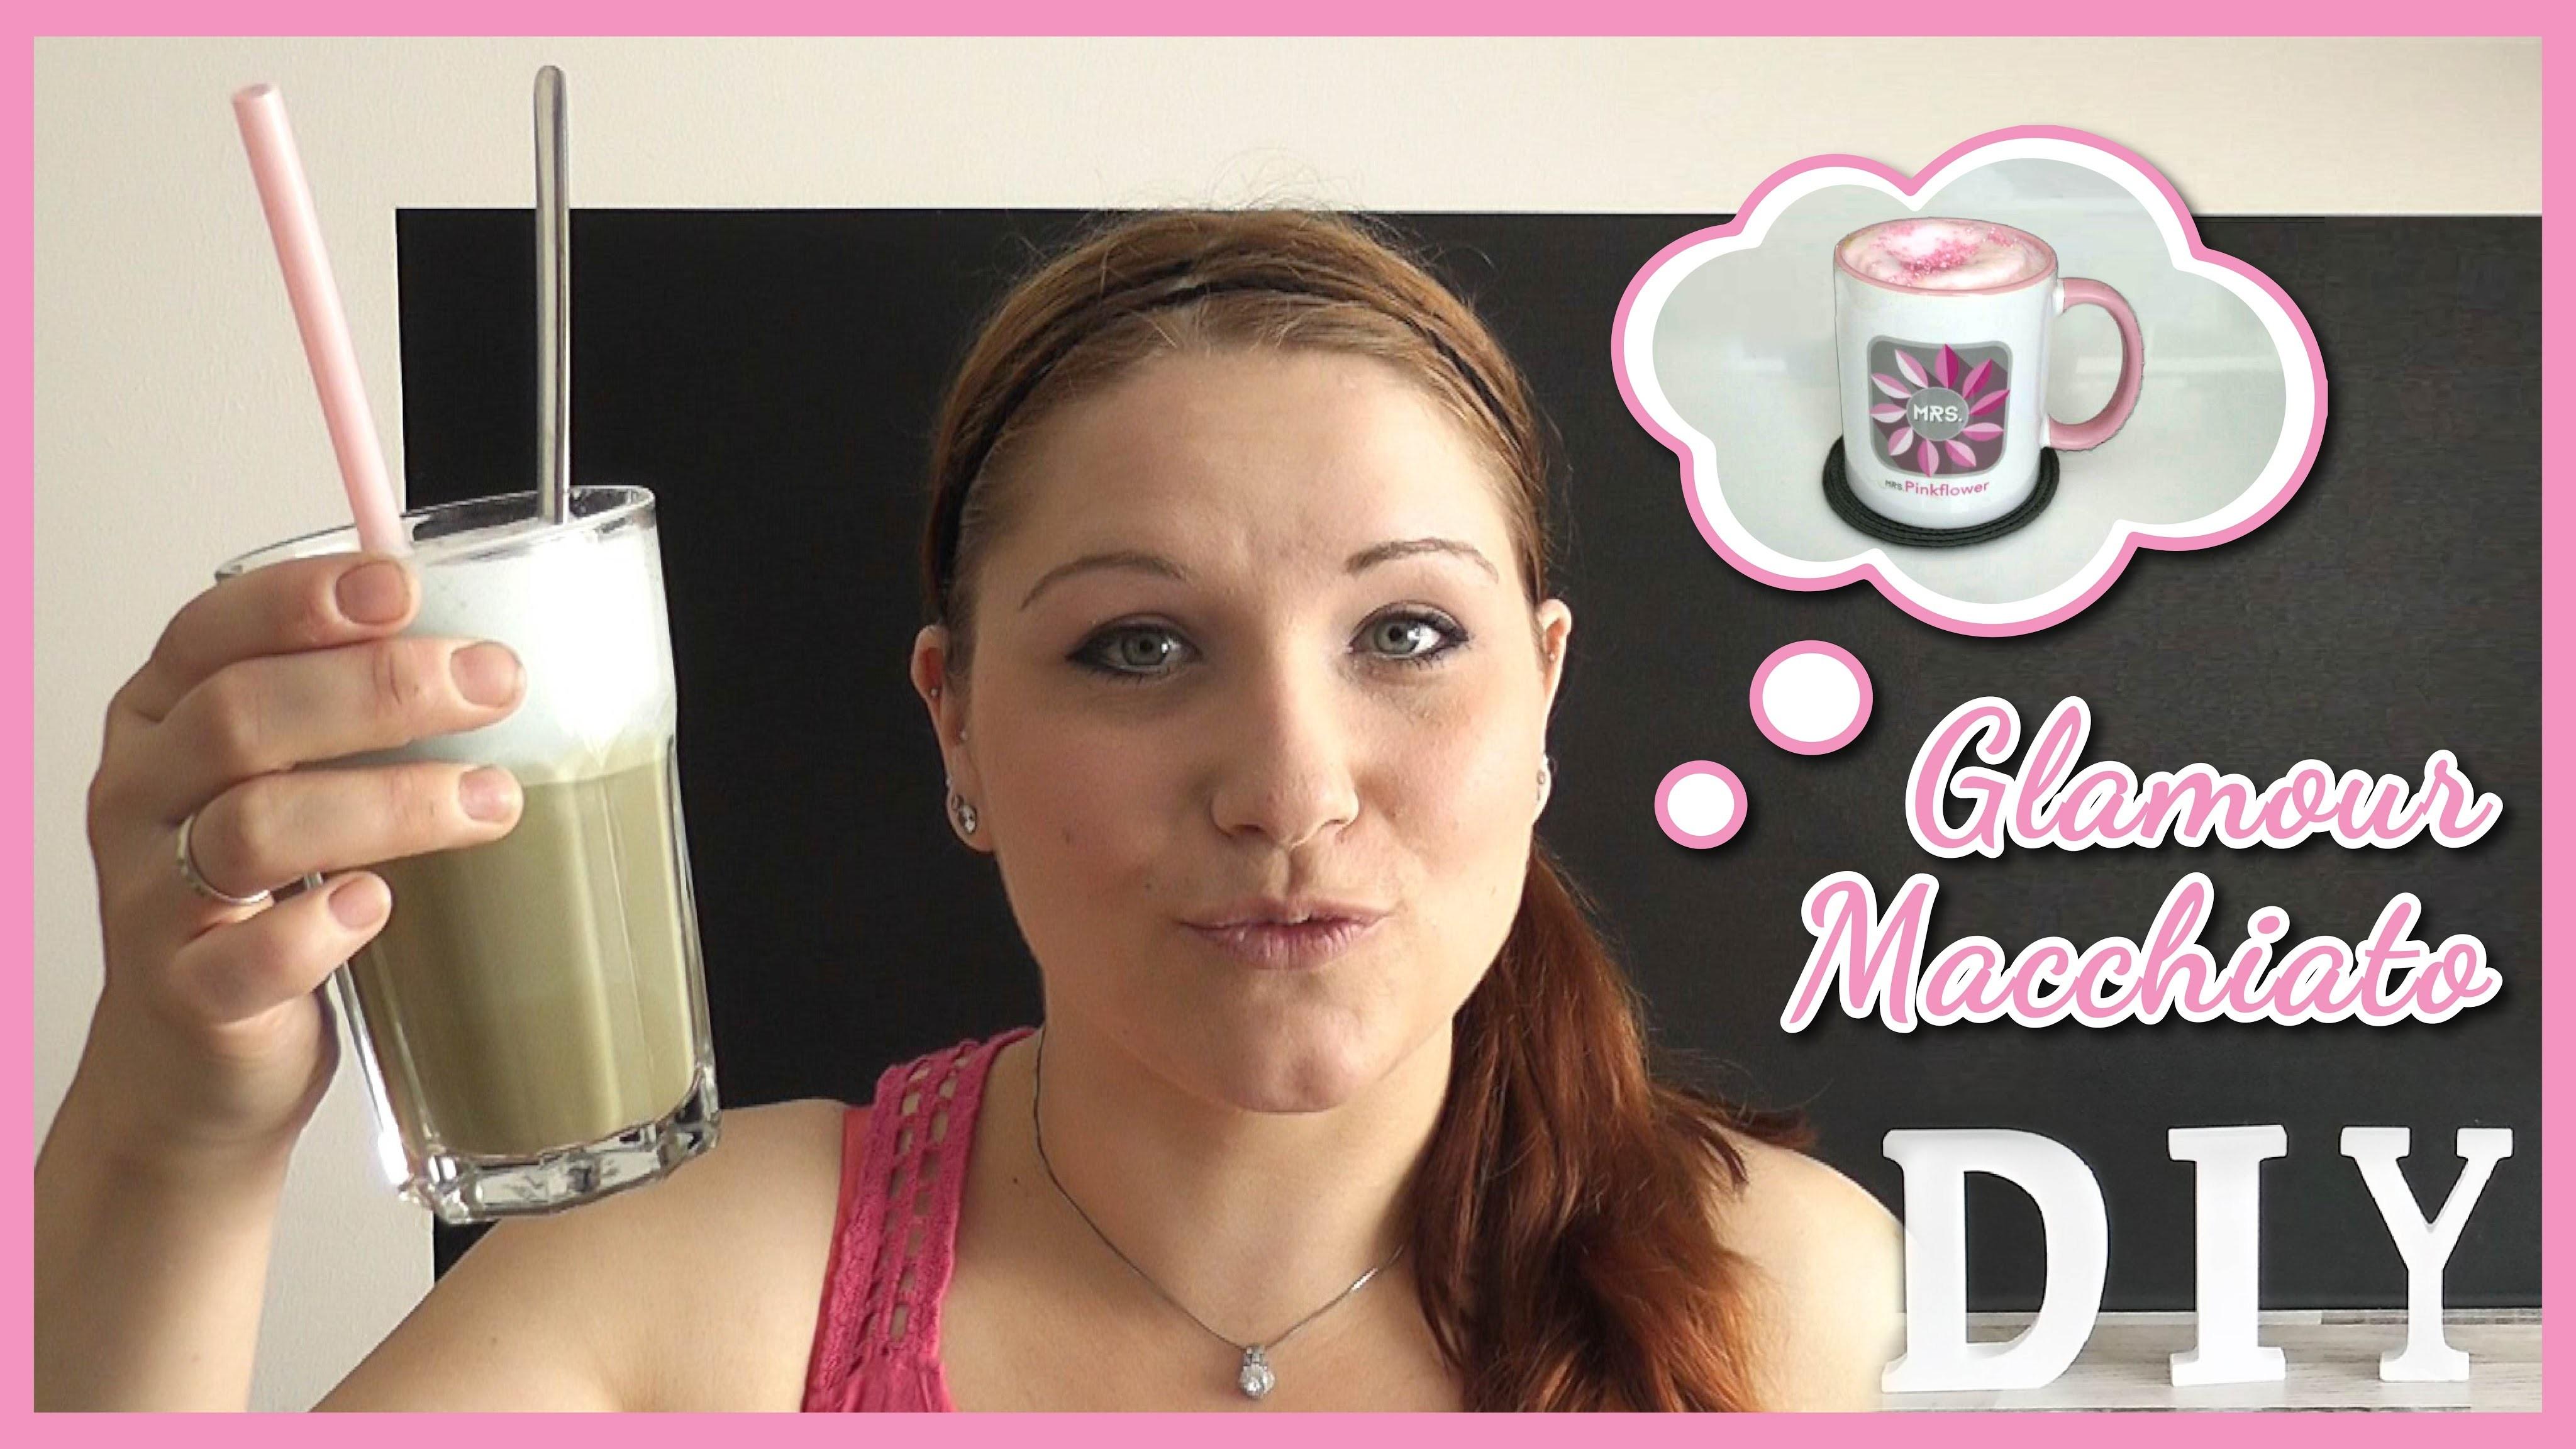 DIY Glamour Macchiato | Homemade Coffee | by Mrs.Pinkflower